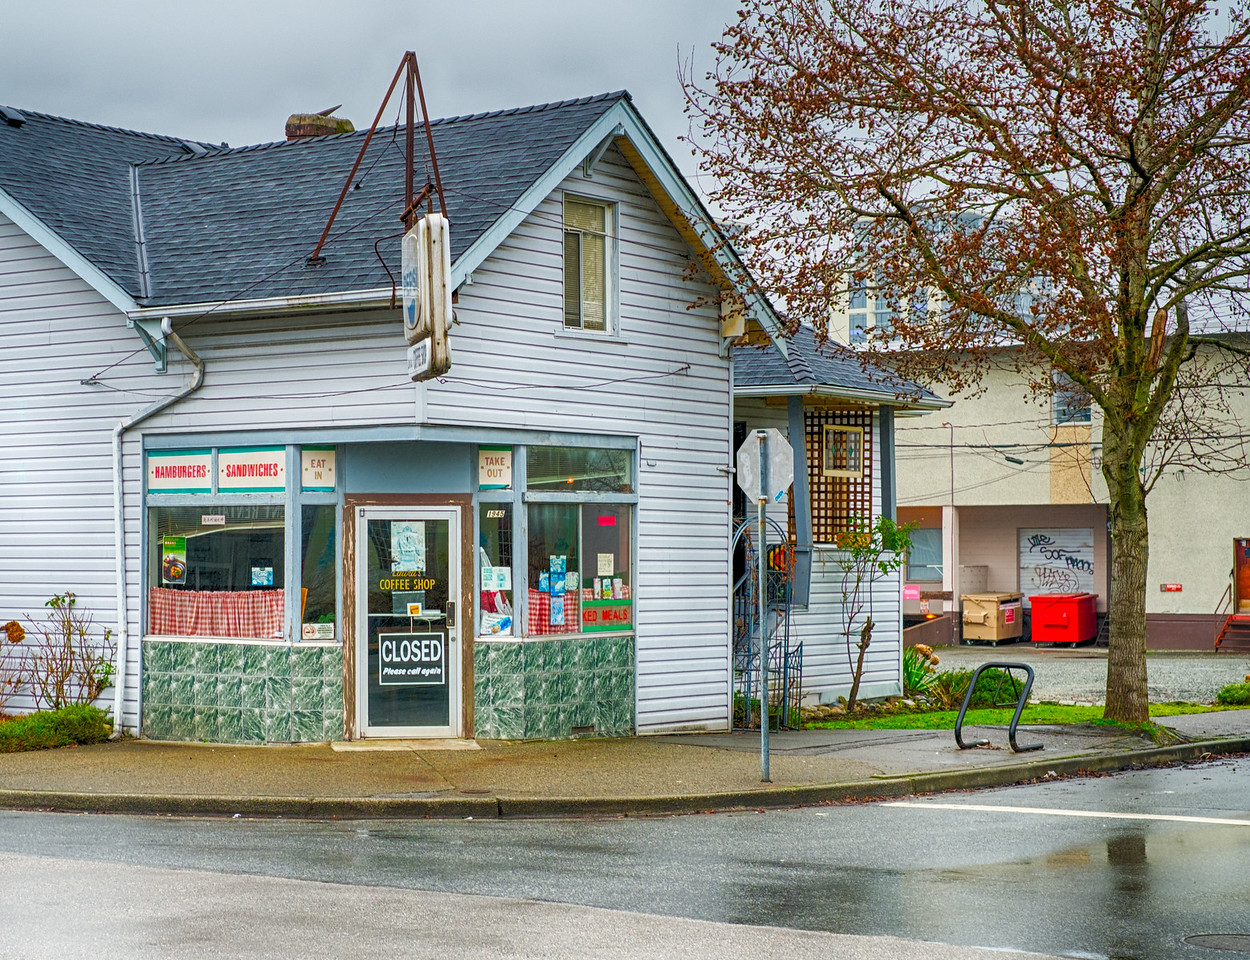 Laura's Coffee Shop